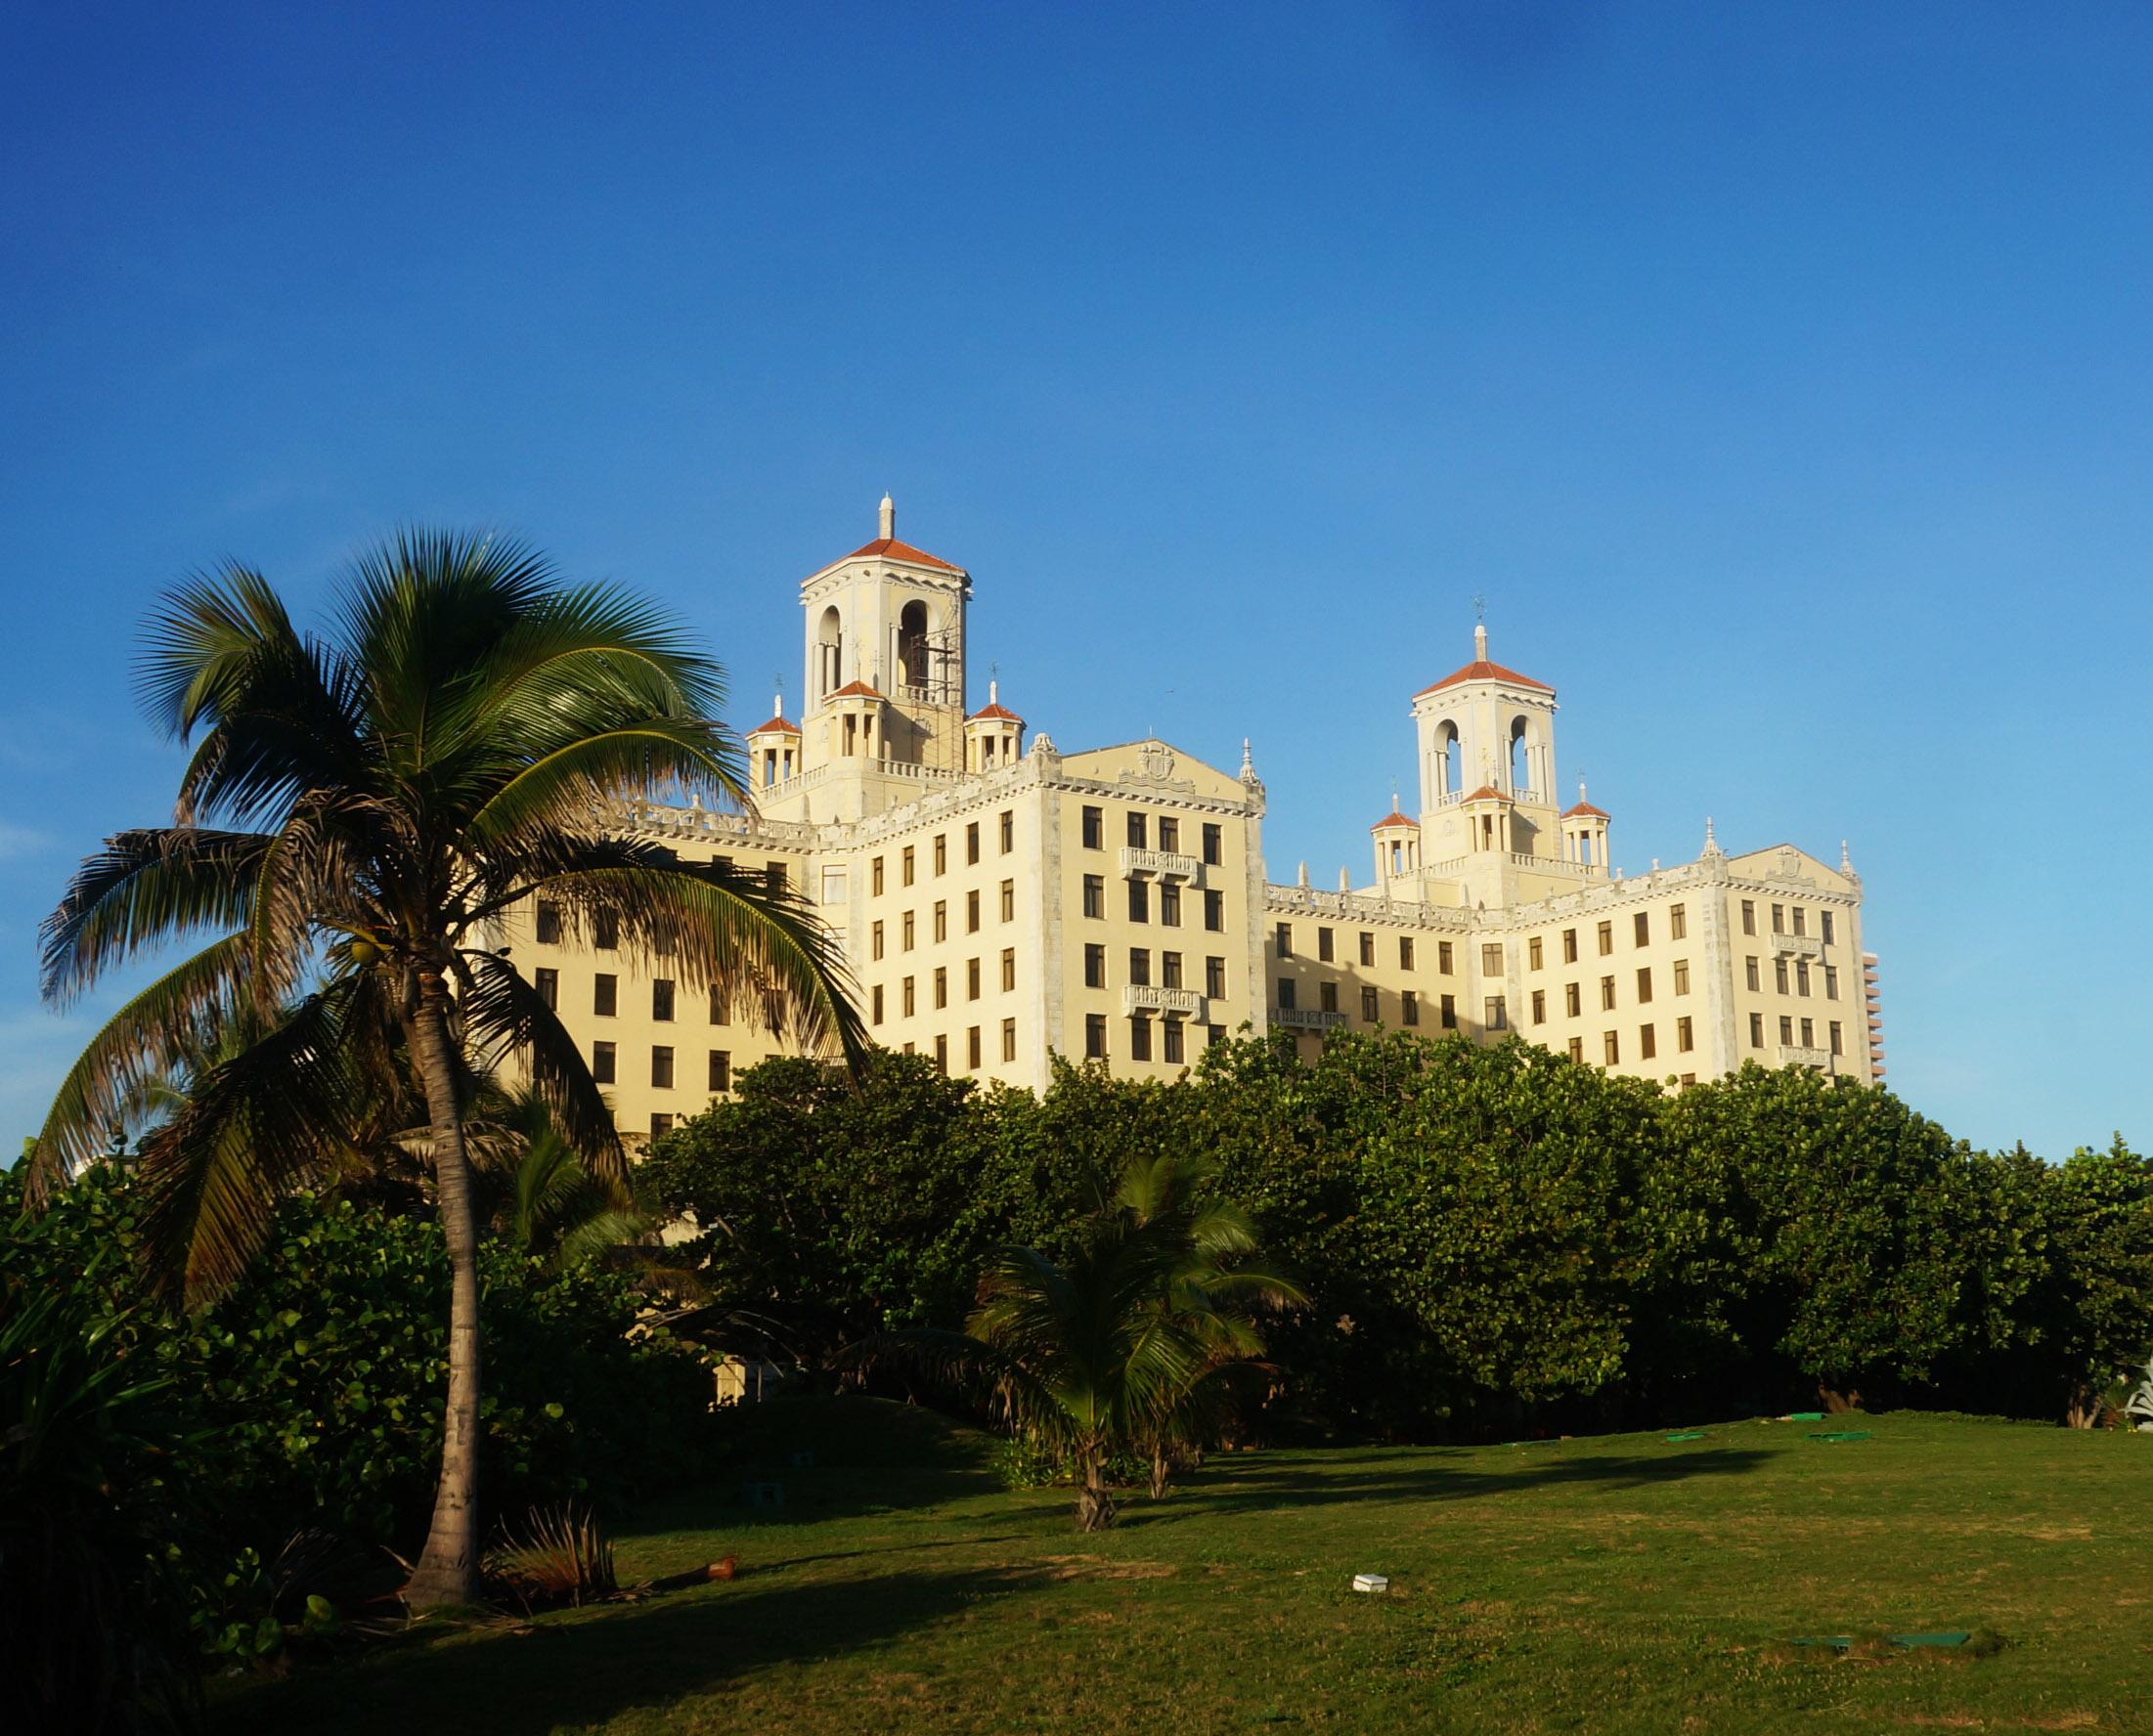 A Walk Through History at the Hotel Nacional de Cuba in Havana